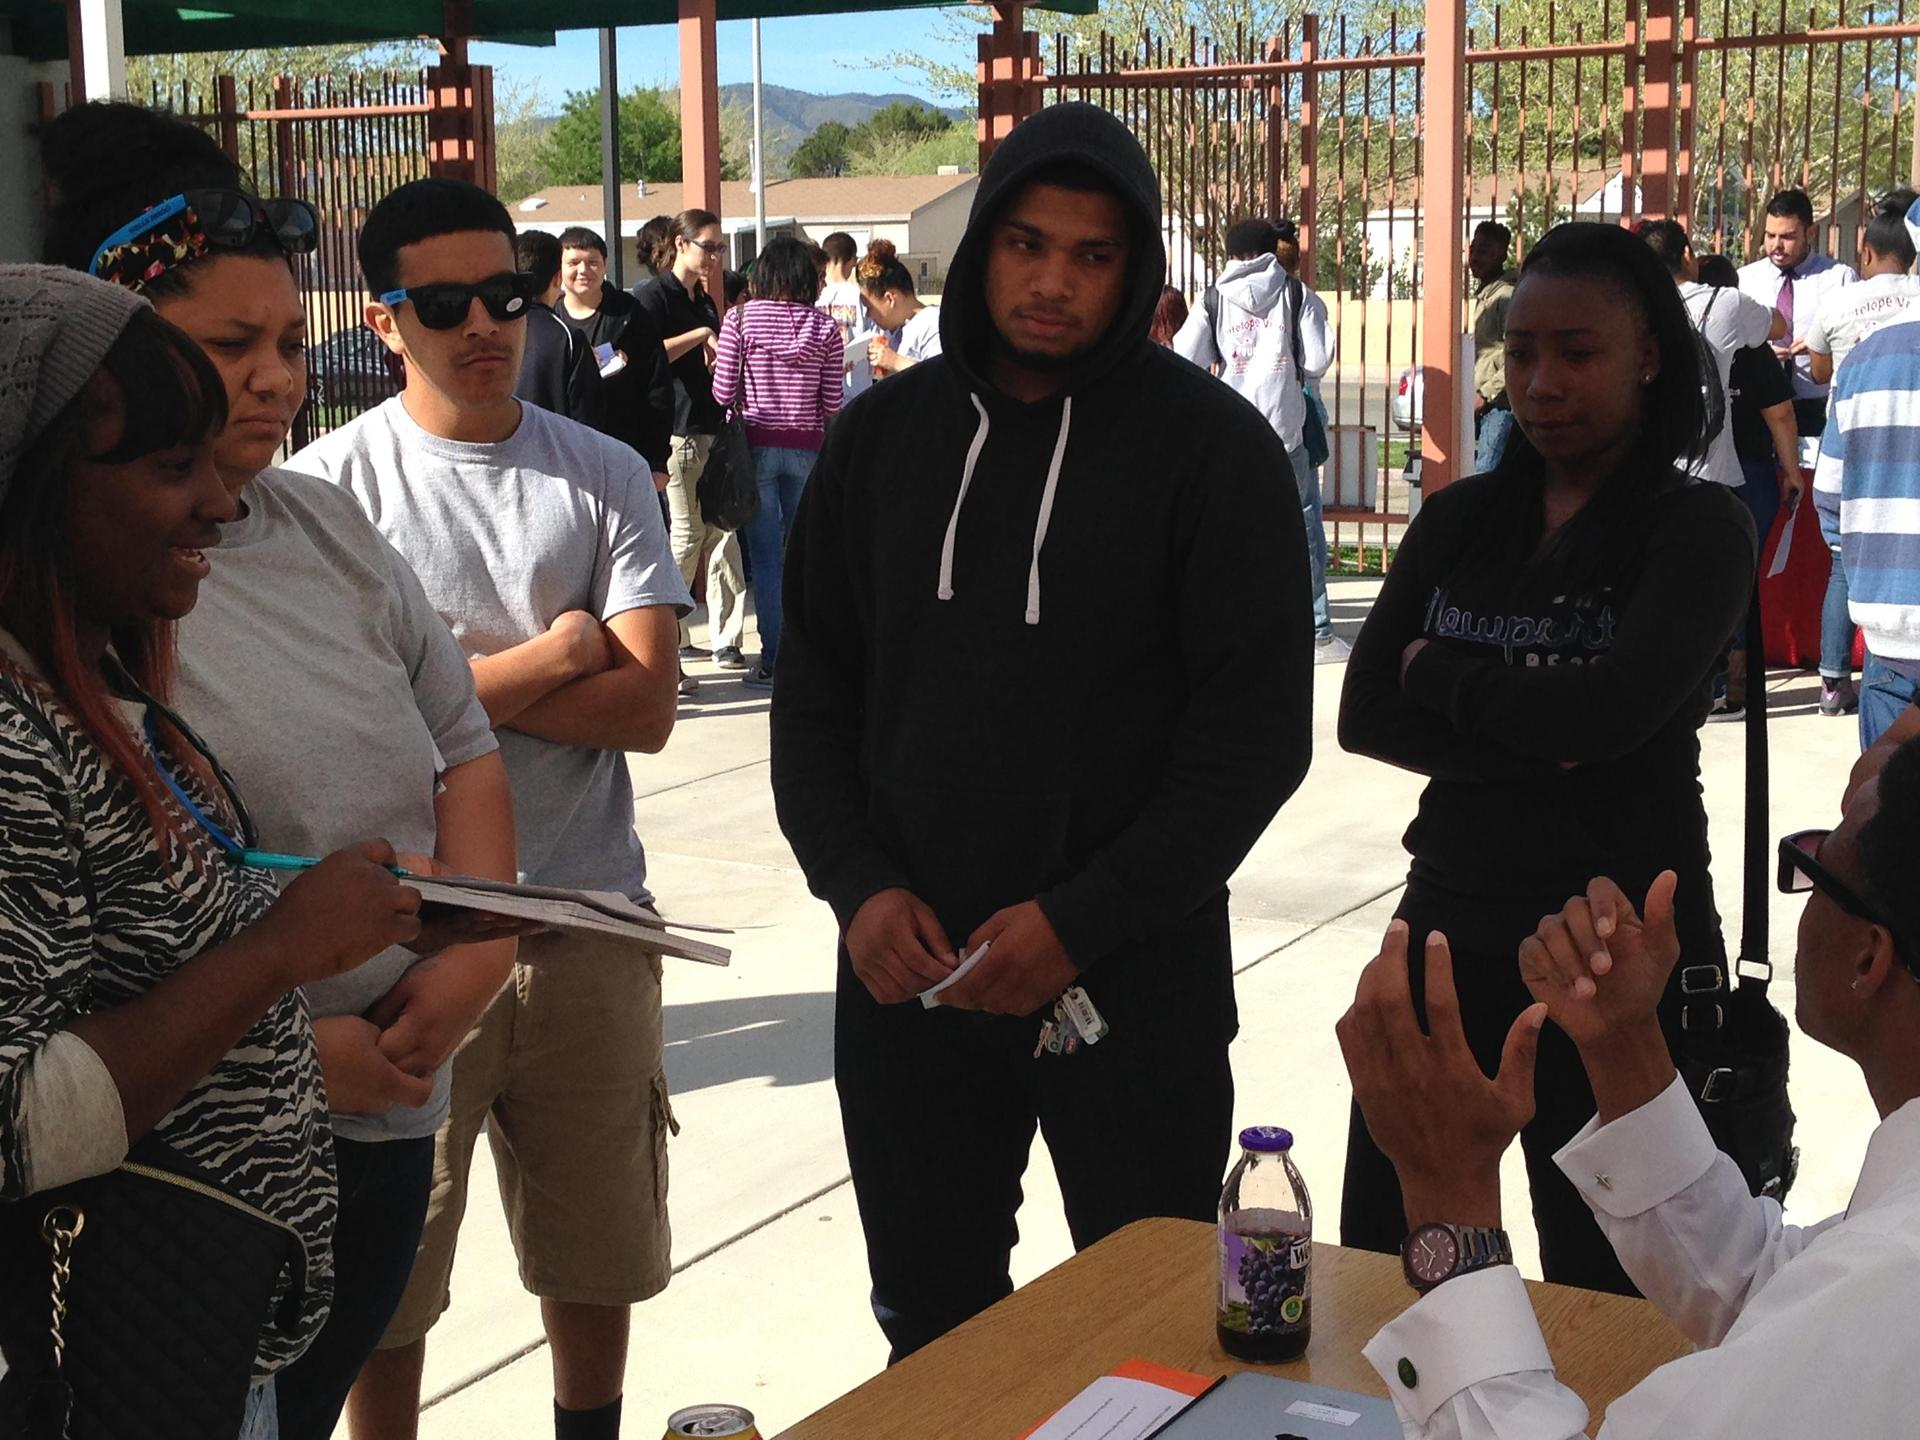 Palmdale students